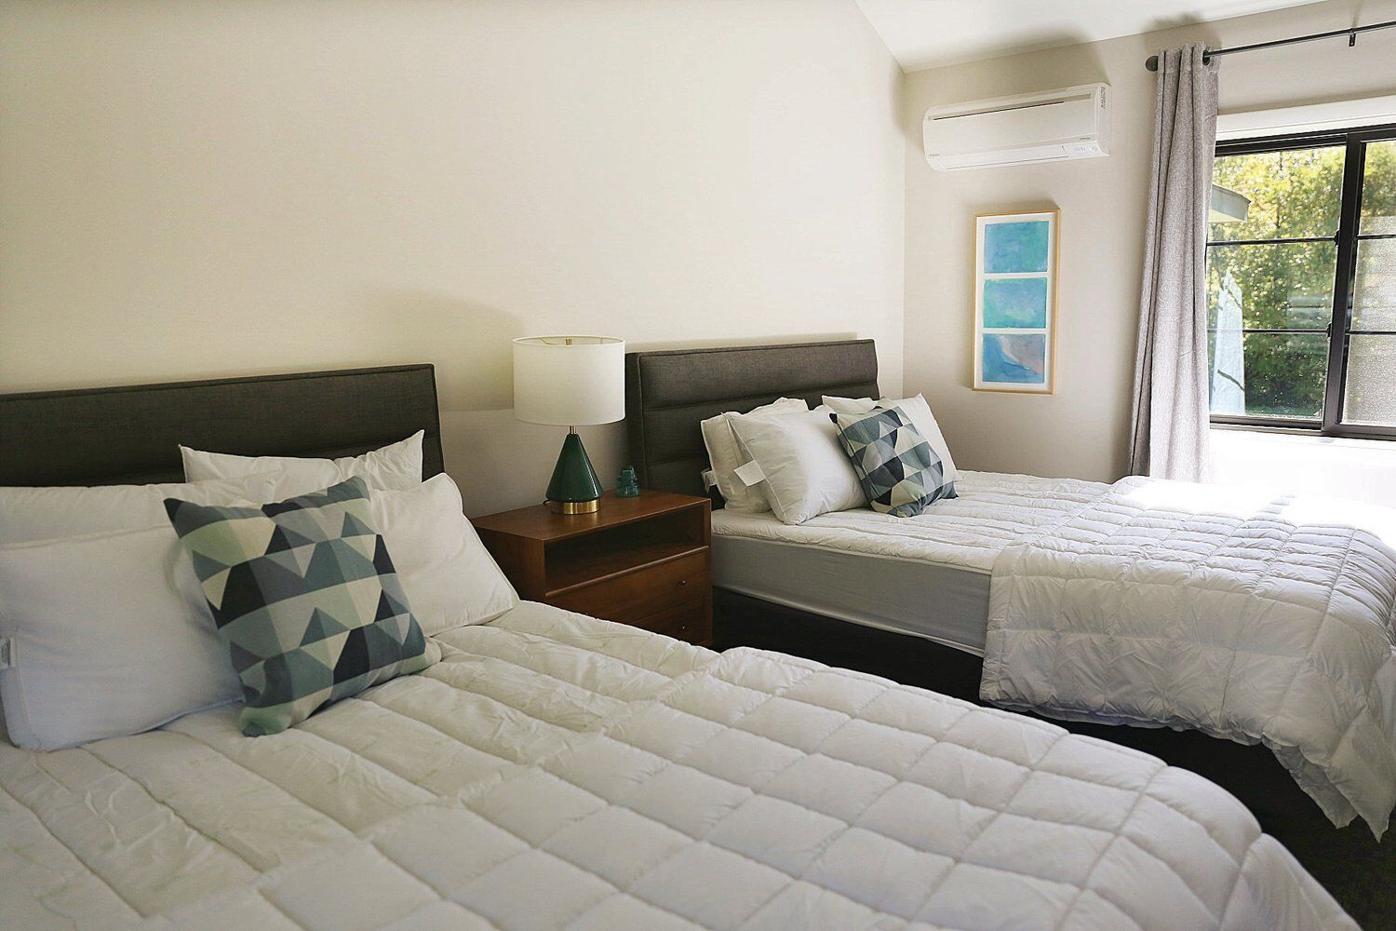 Modernized Manchester motel set to reopen after renovations